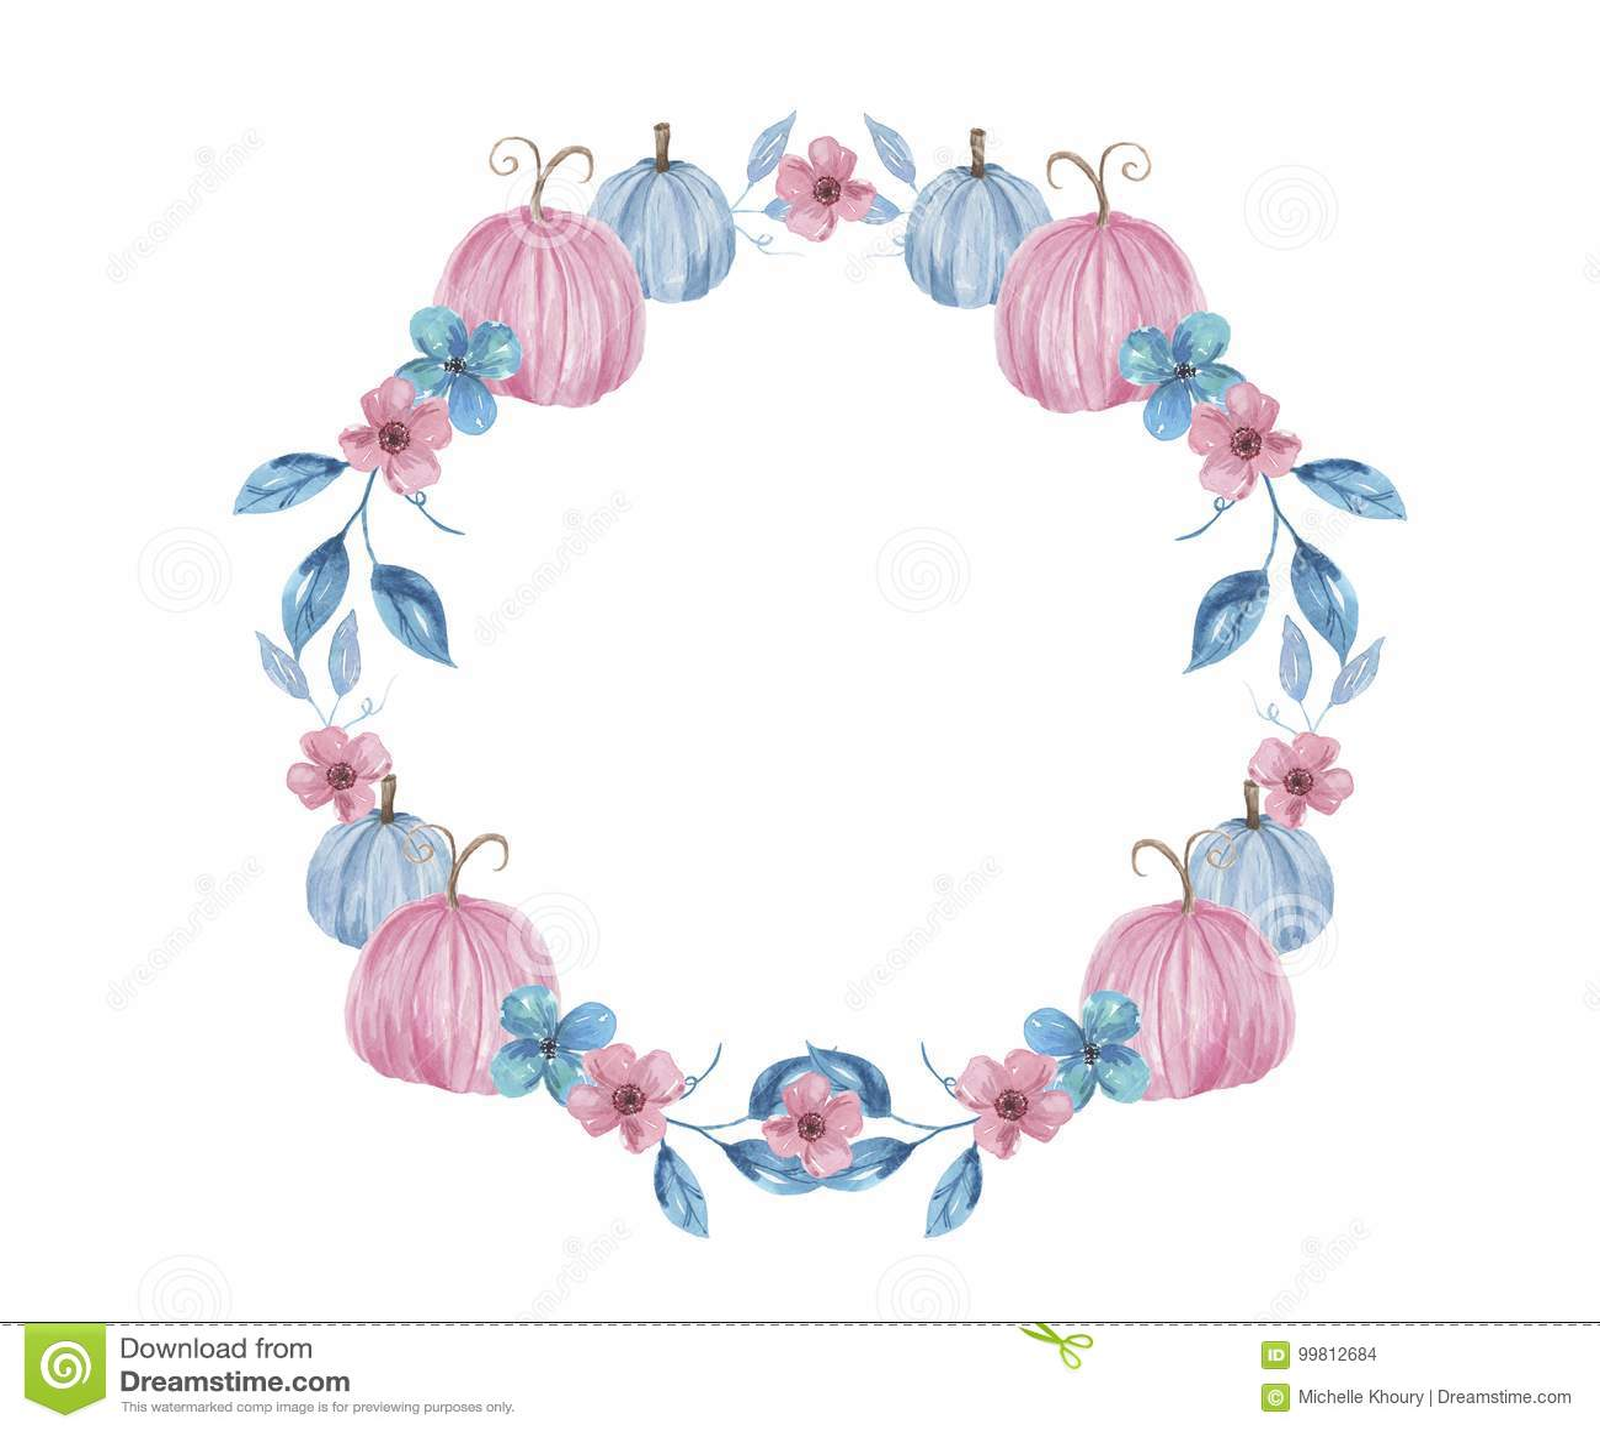 Watercolor Blue Pink Autumn Fallhand Painted Pumpkin Wreath Stock Illustration Illustration Of Invitations Fall 99812684